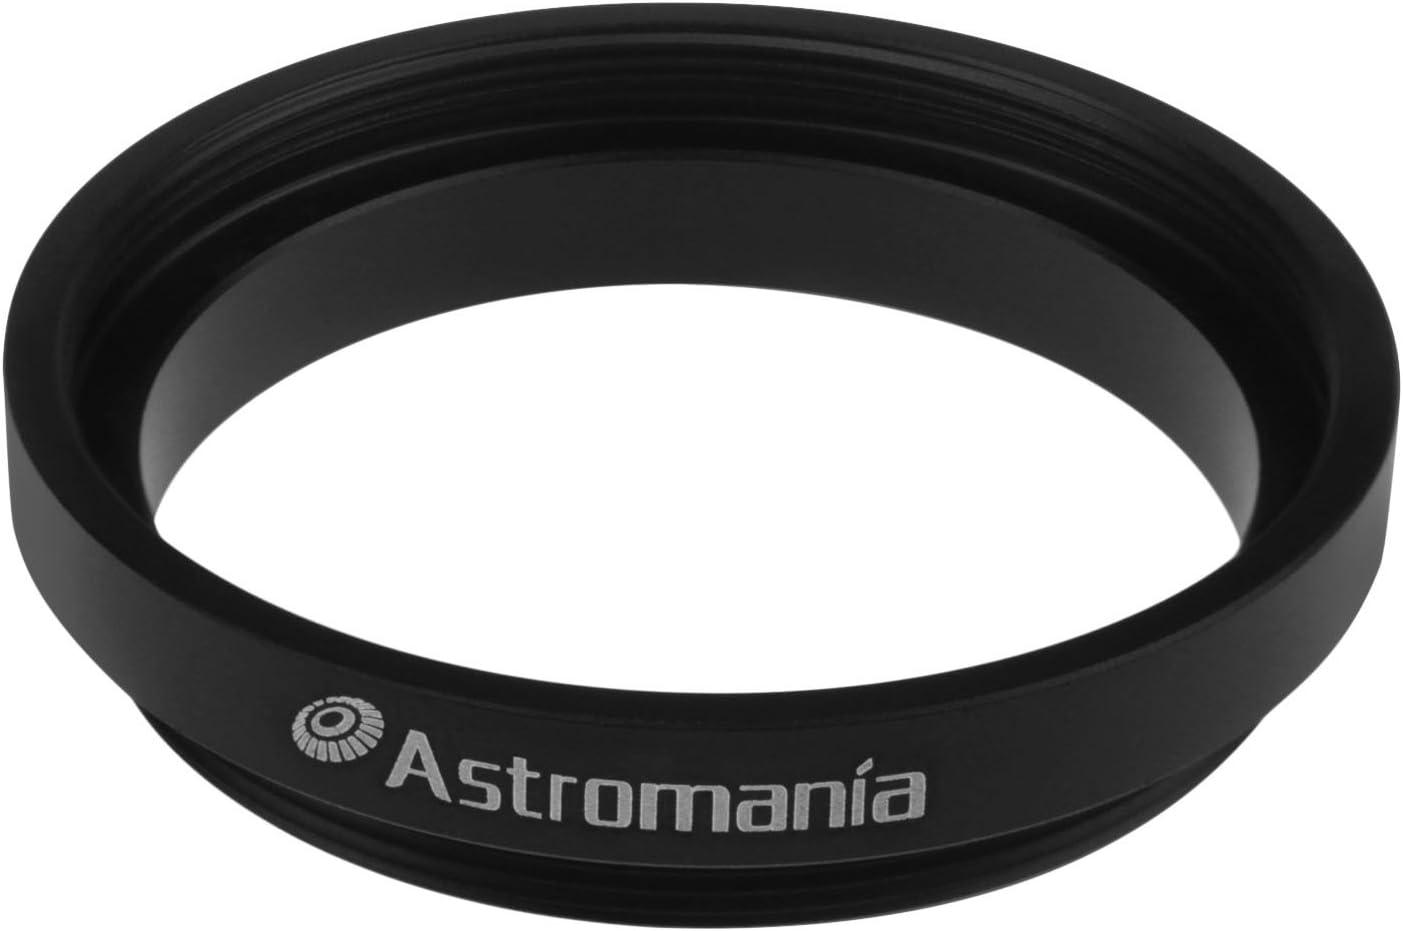 Eyepiece Astromania M43x0.75 Female to M42X0.75 T // T2 Male Thread Telescope Adapter SWA The Camera Adapter for Astromania 1.25//2-70 Degree Super Wide Angle